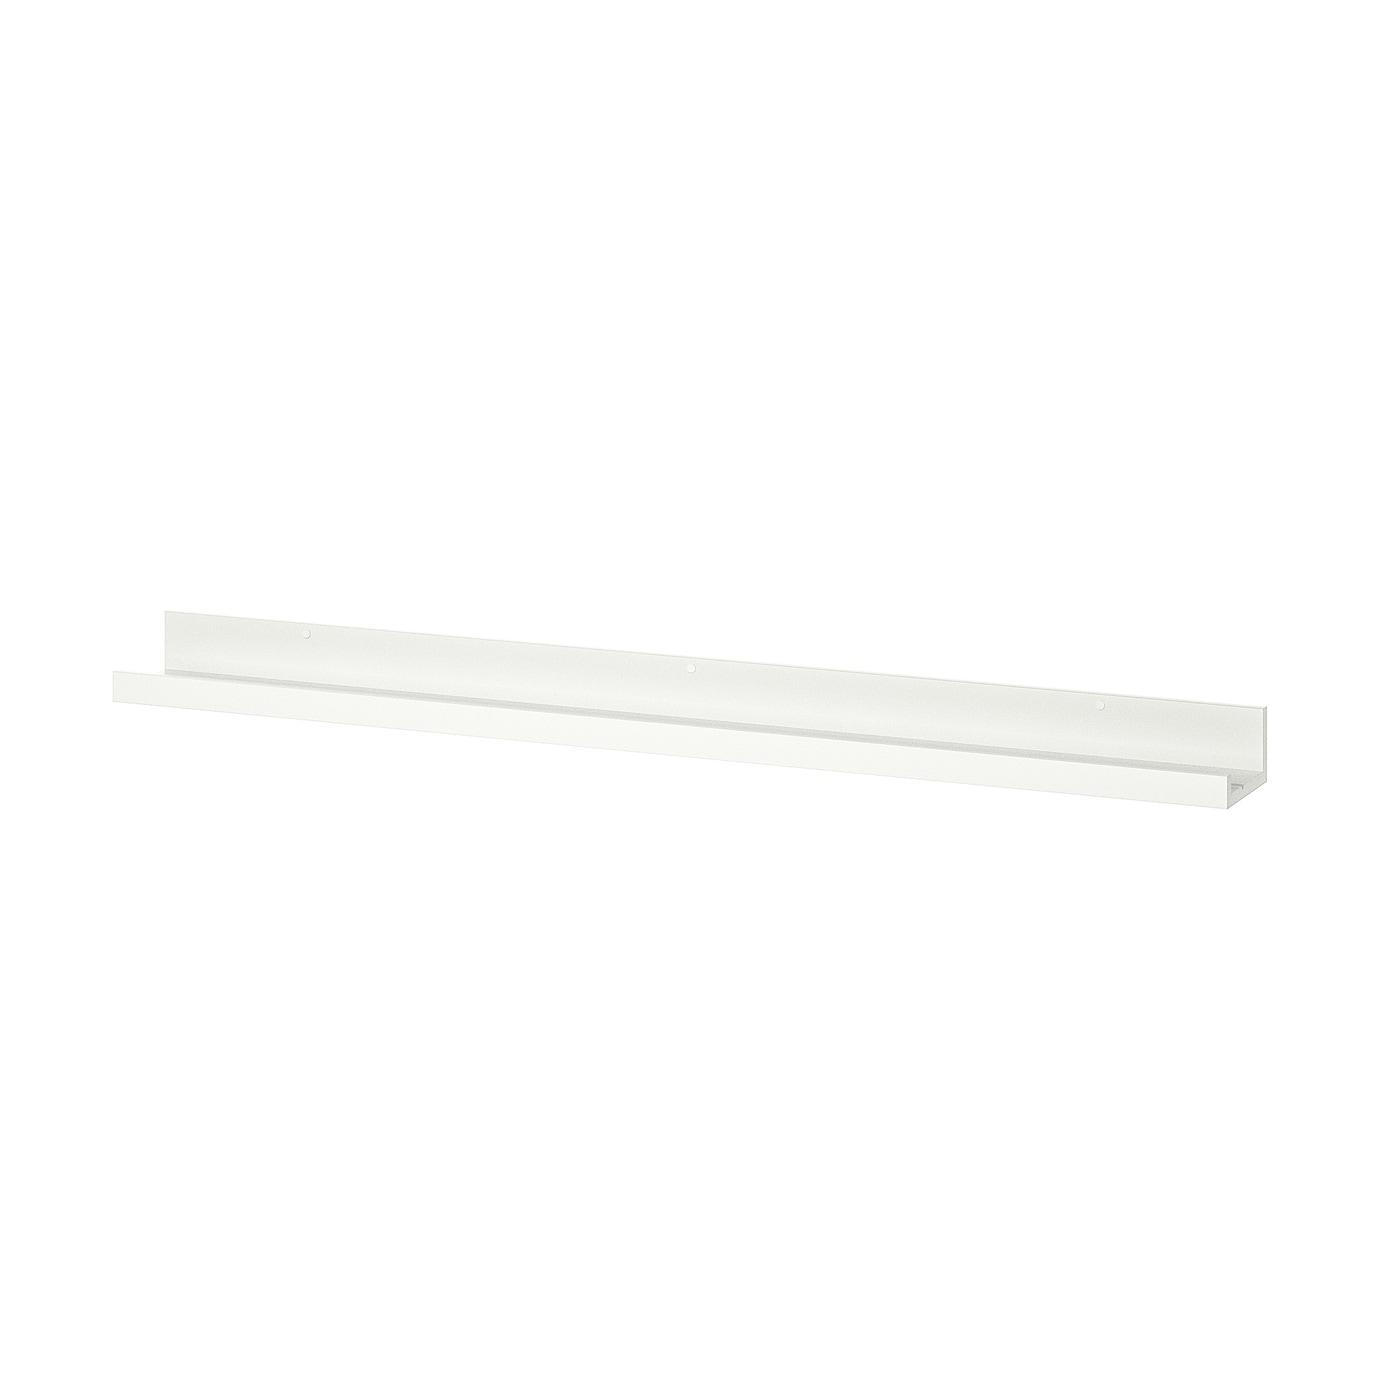 Mosslanda Estante Para Cuadros Blanco 115 Cm Ikea